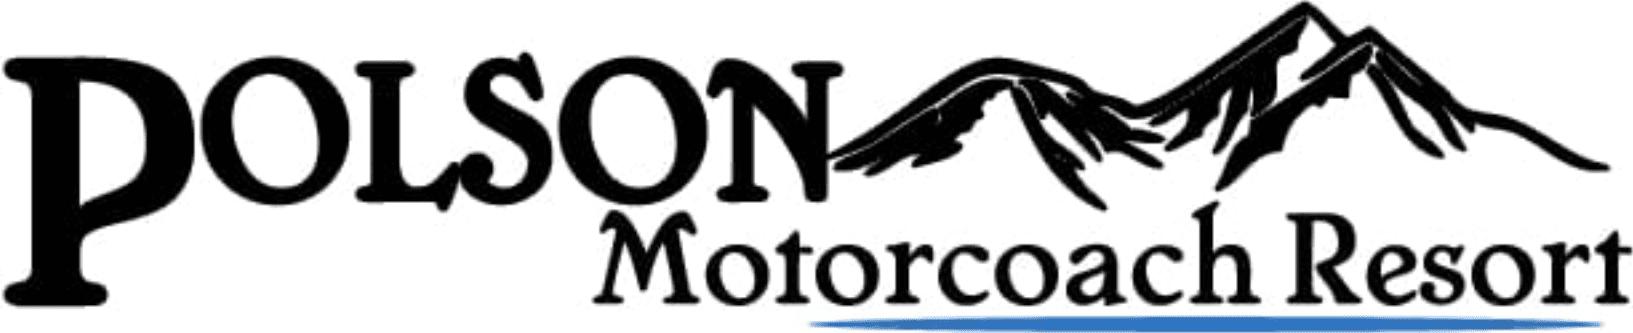 Polson Motocoach Resort